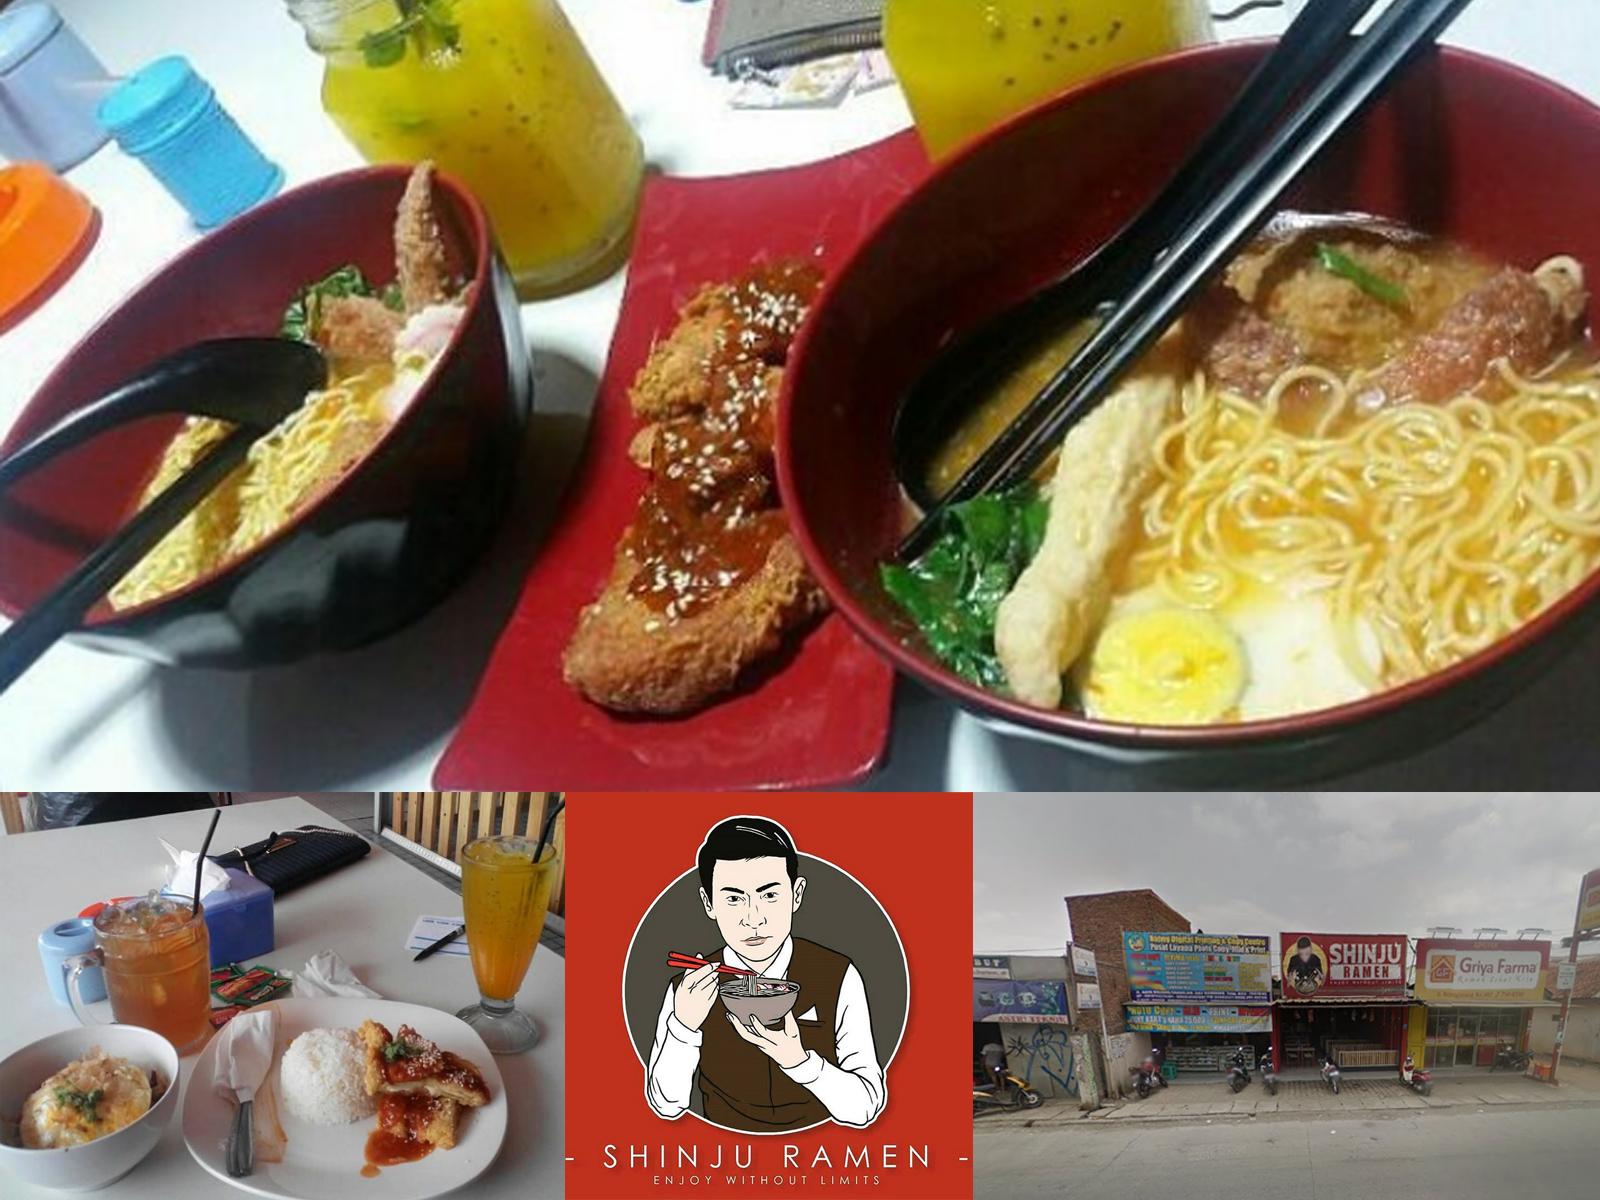 Shinju Ramen Bojongsoang, Tempat Kuliner dan Nongkrong Anak Muda - wisatabdg.com